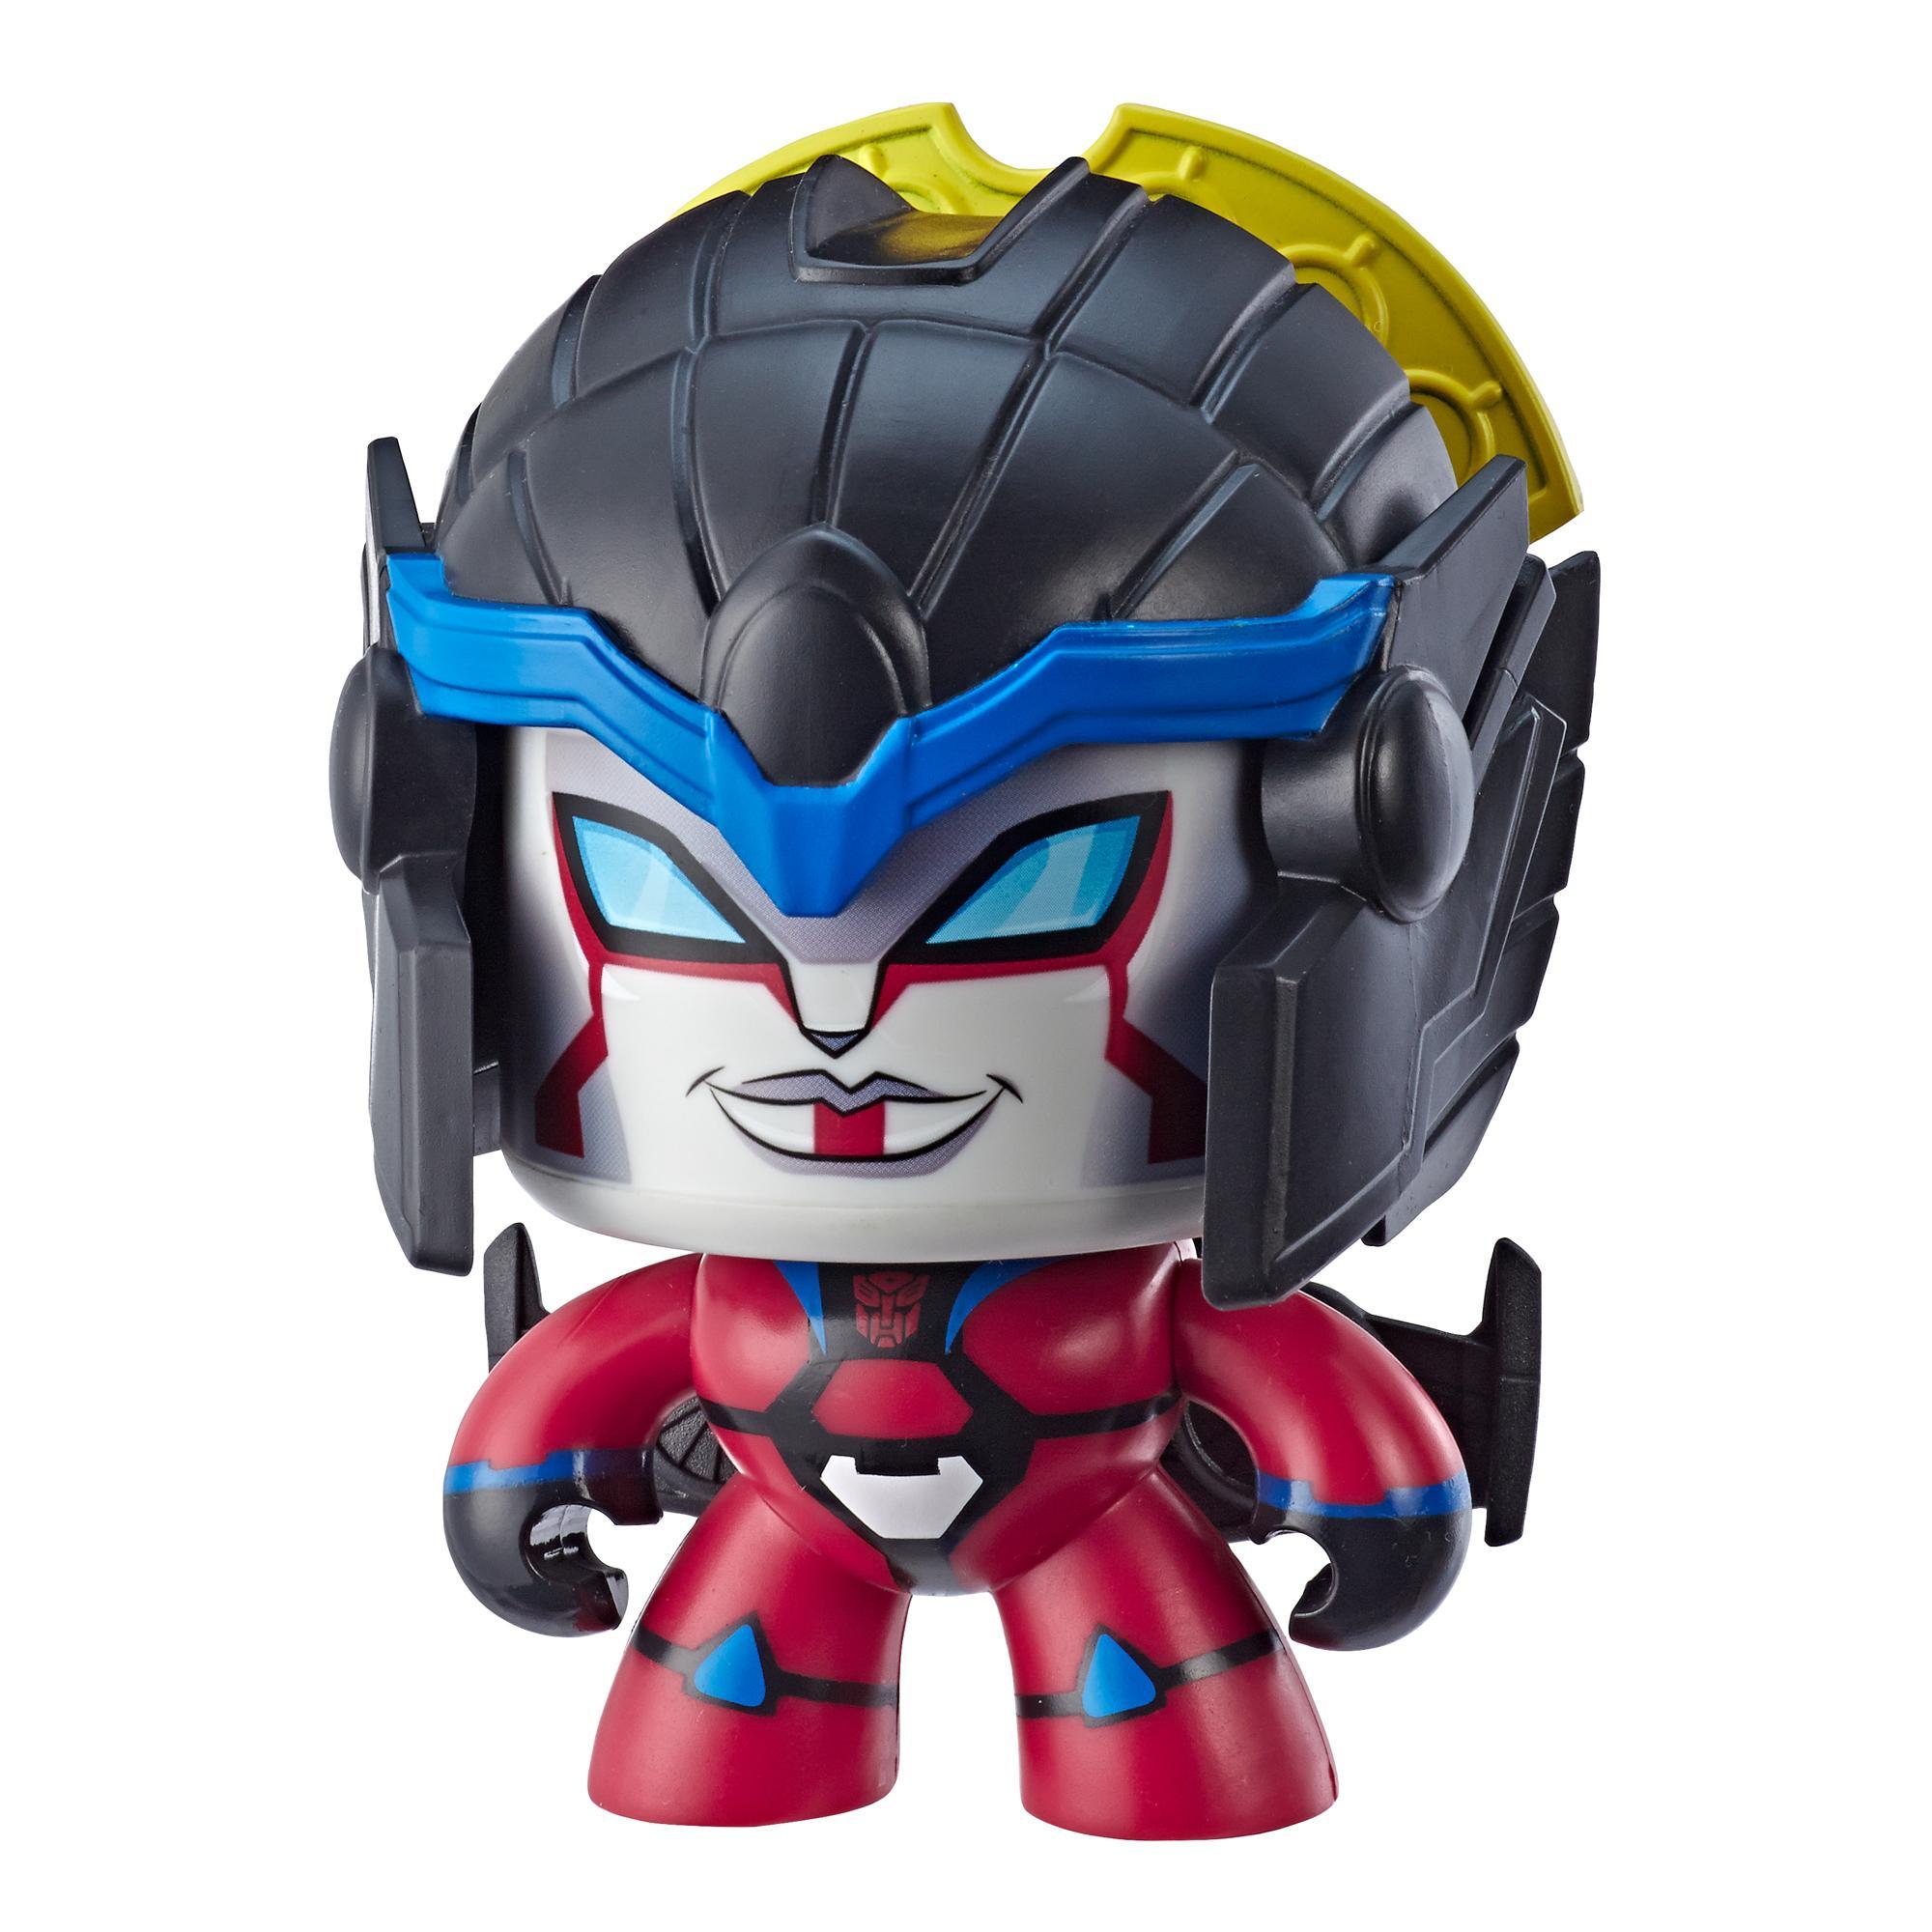 Transformers Mighty Muggs Windblade #6